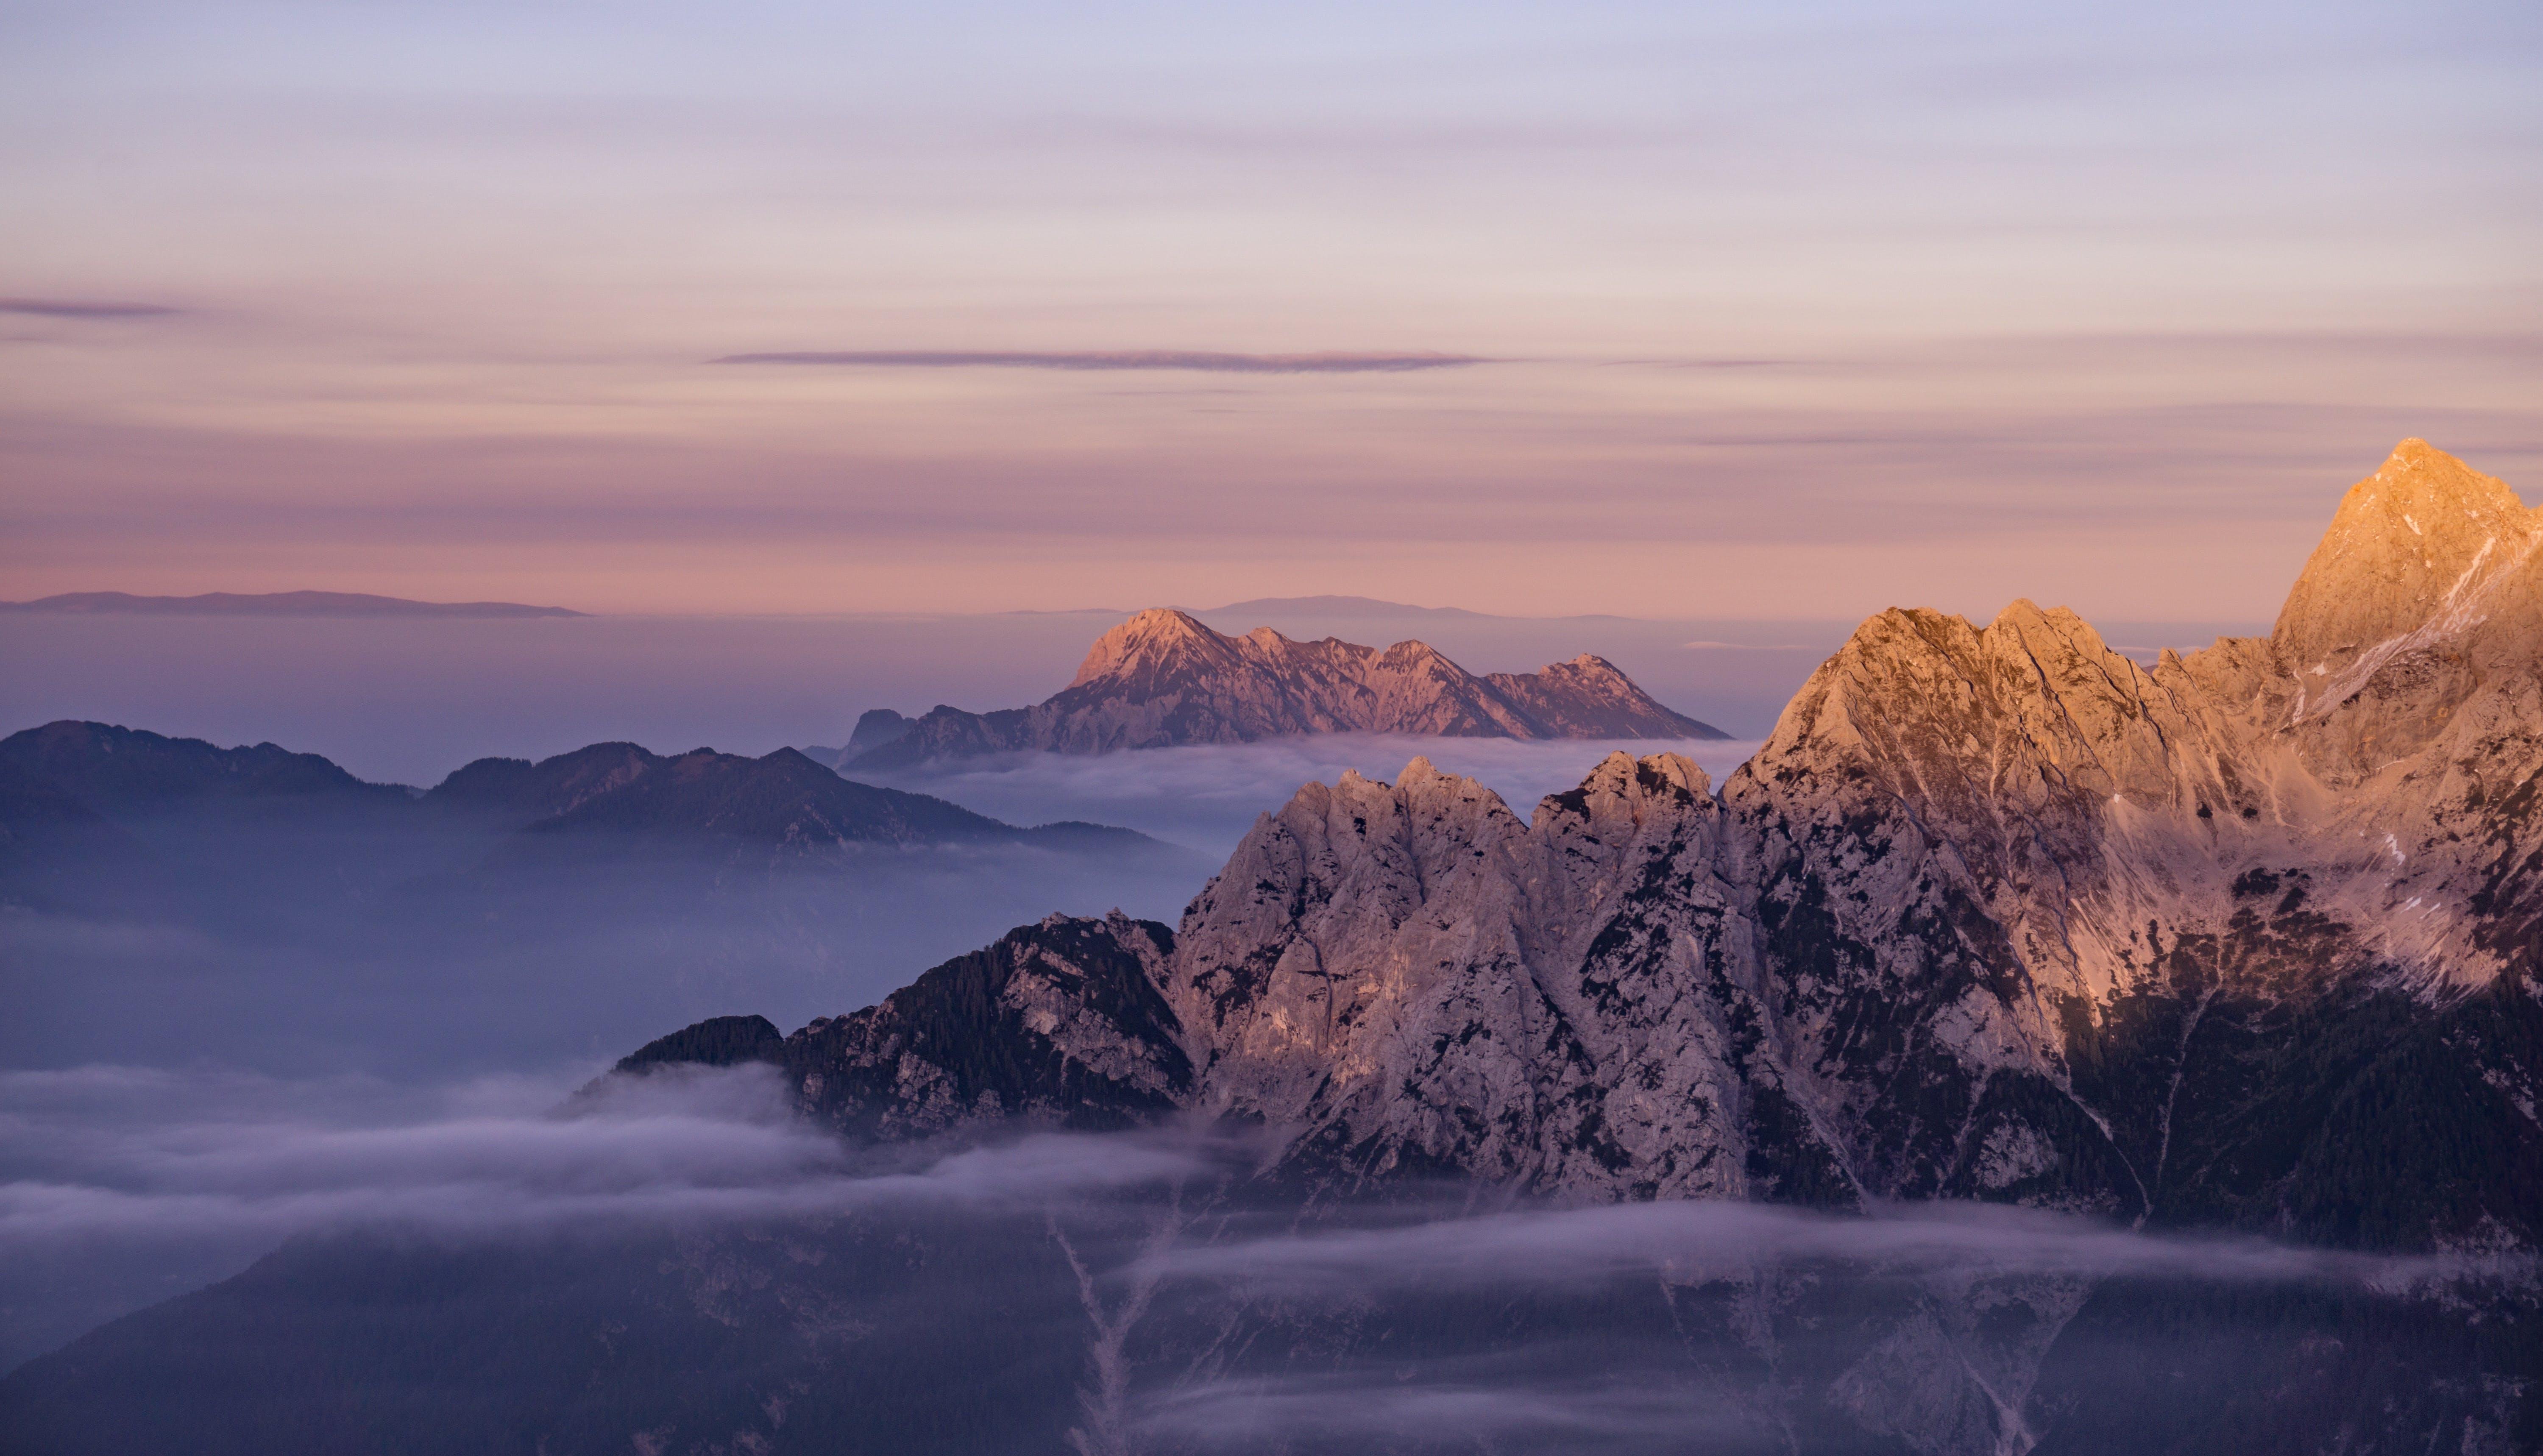 Mountain Ranges Under Orange Sunset